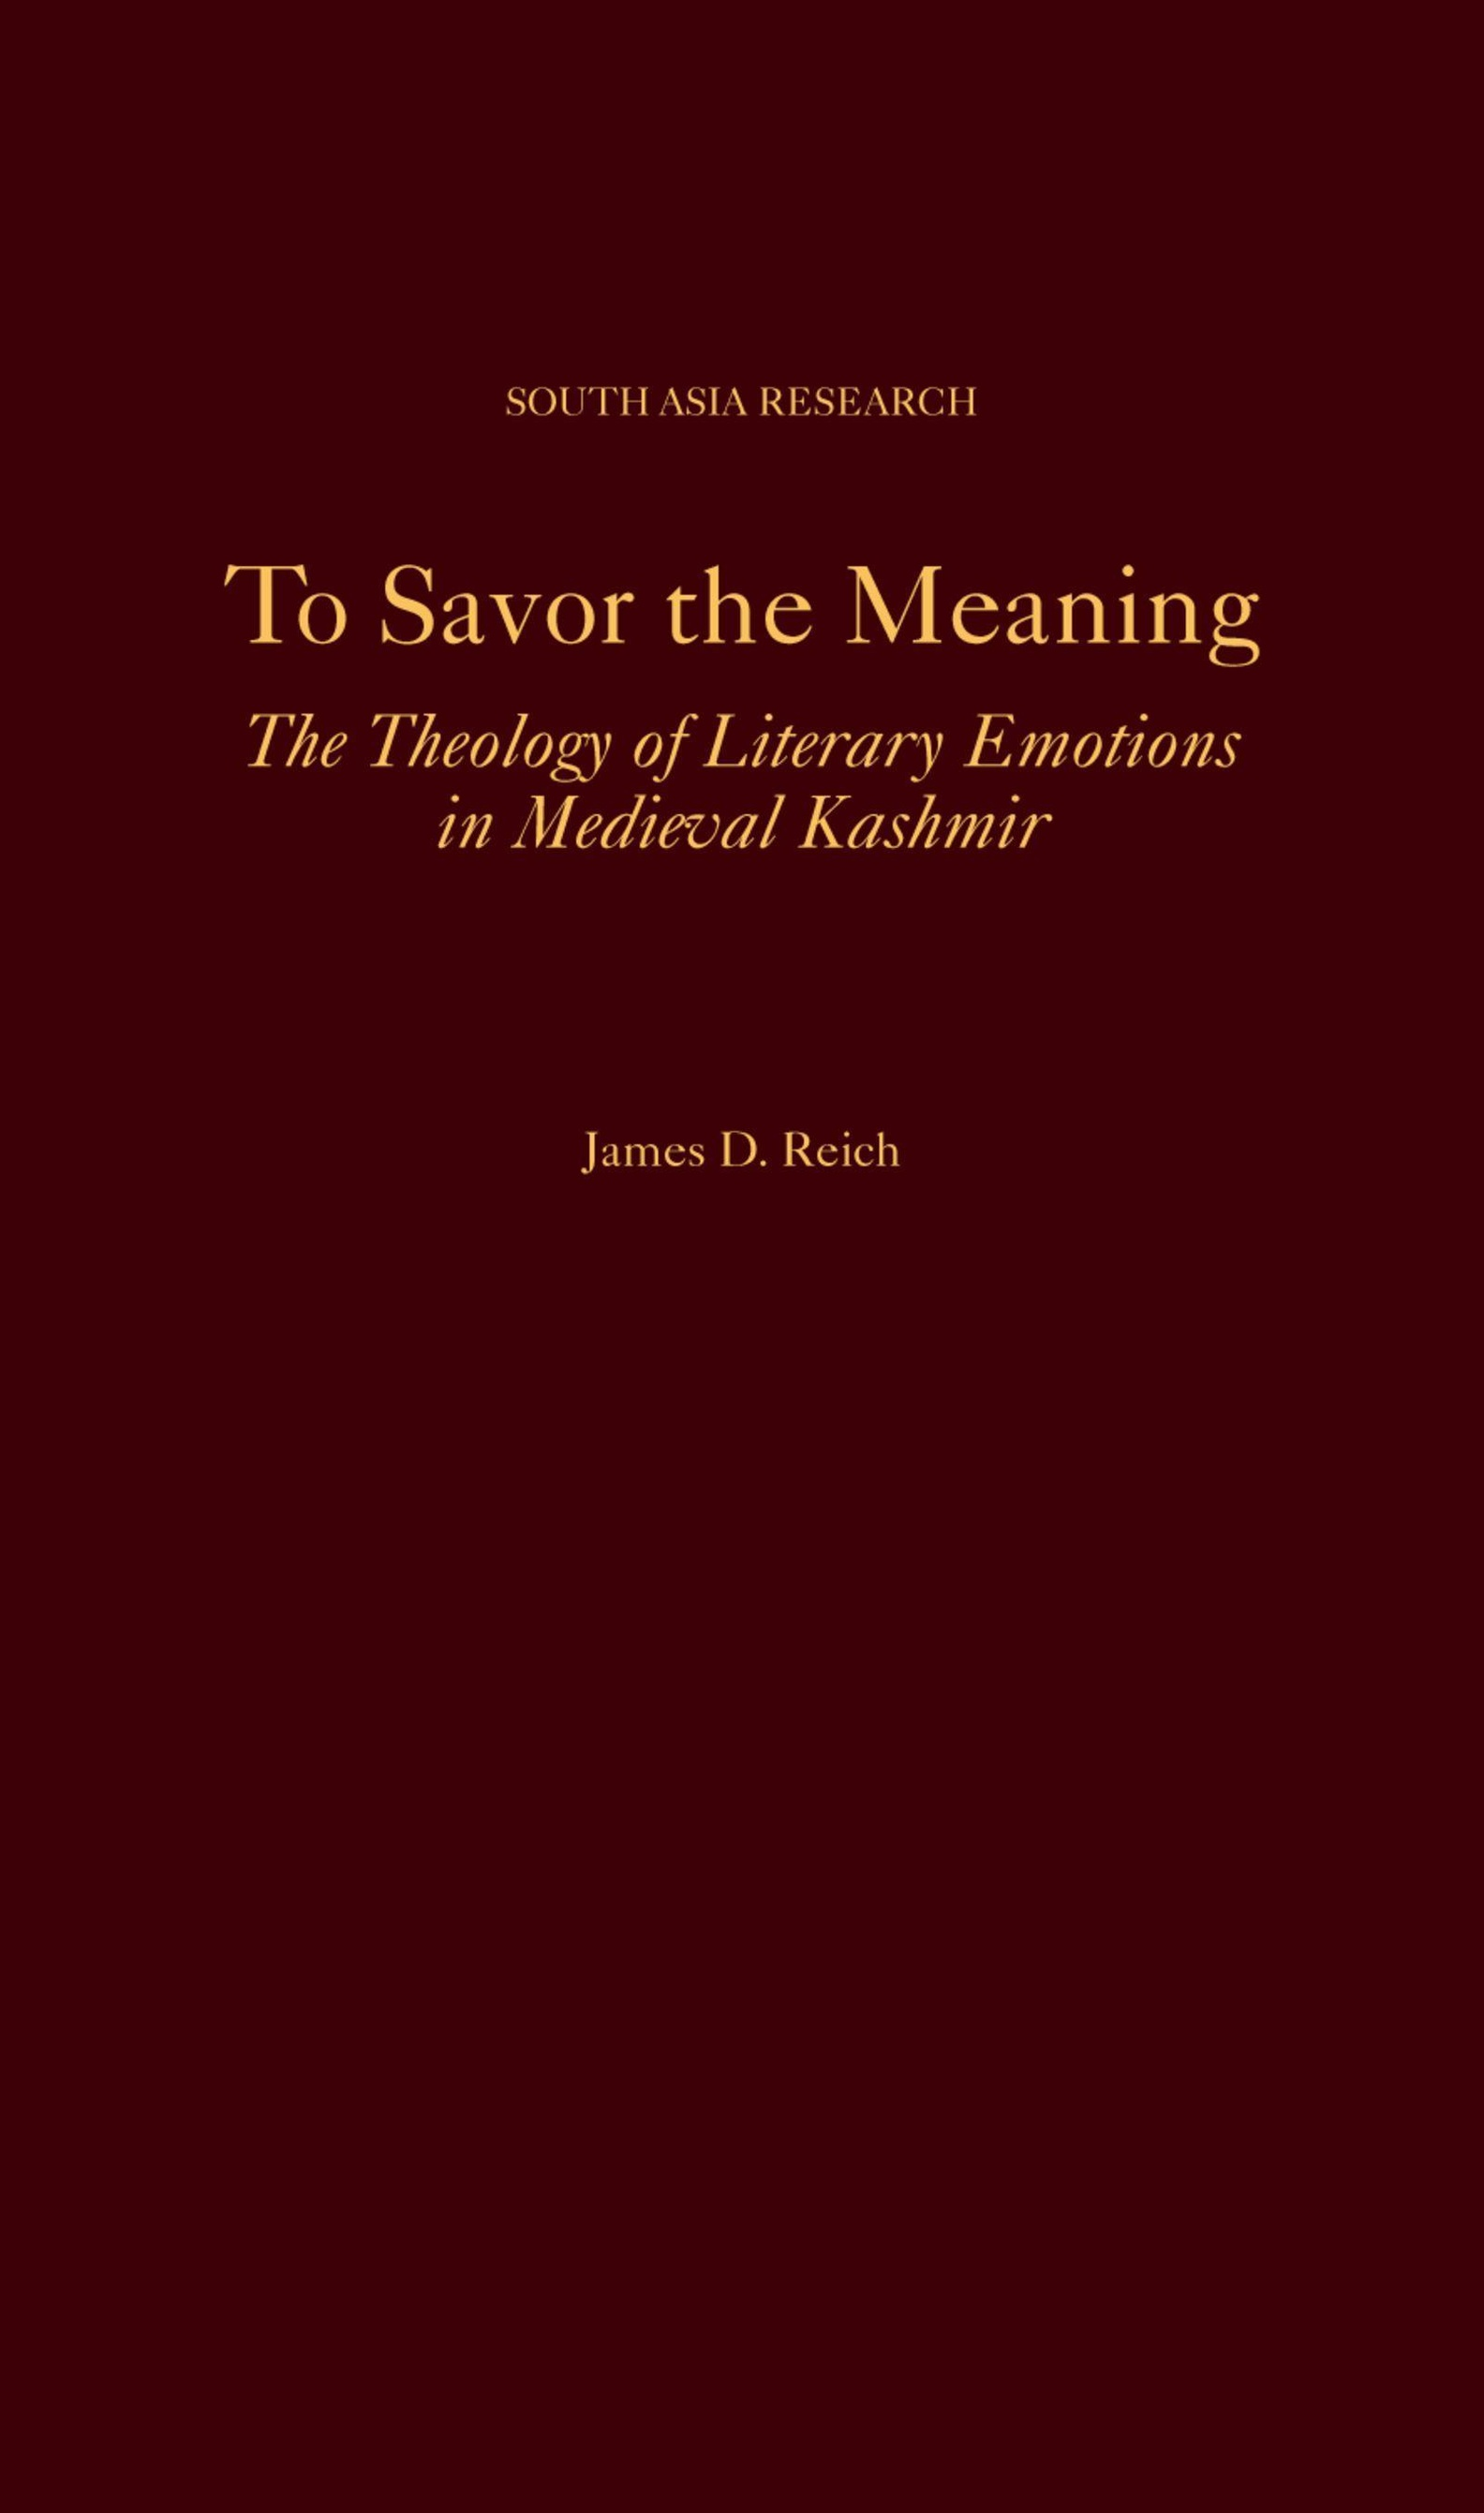 To Savor the Meaning ebook jetzt bei Weltbild.de als Download